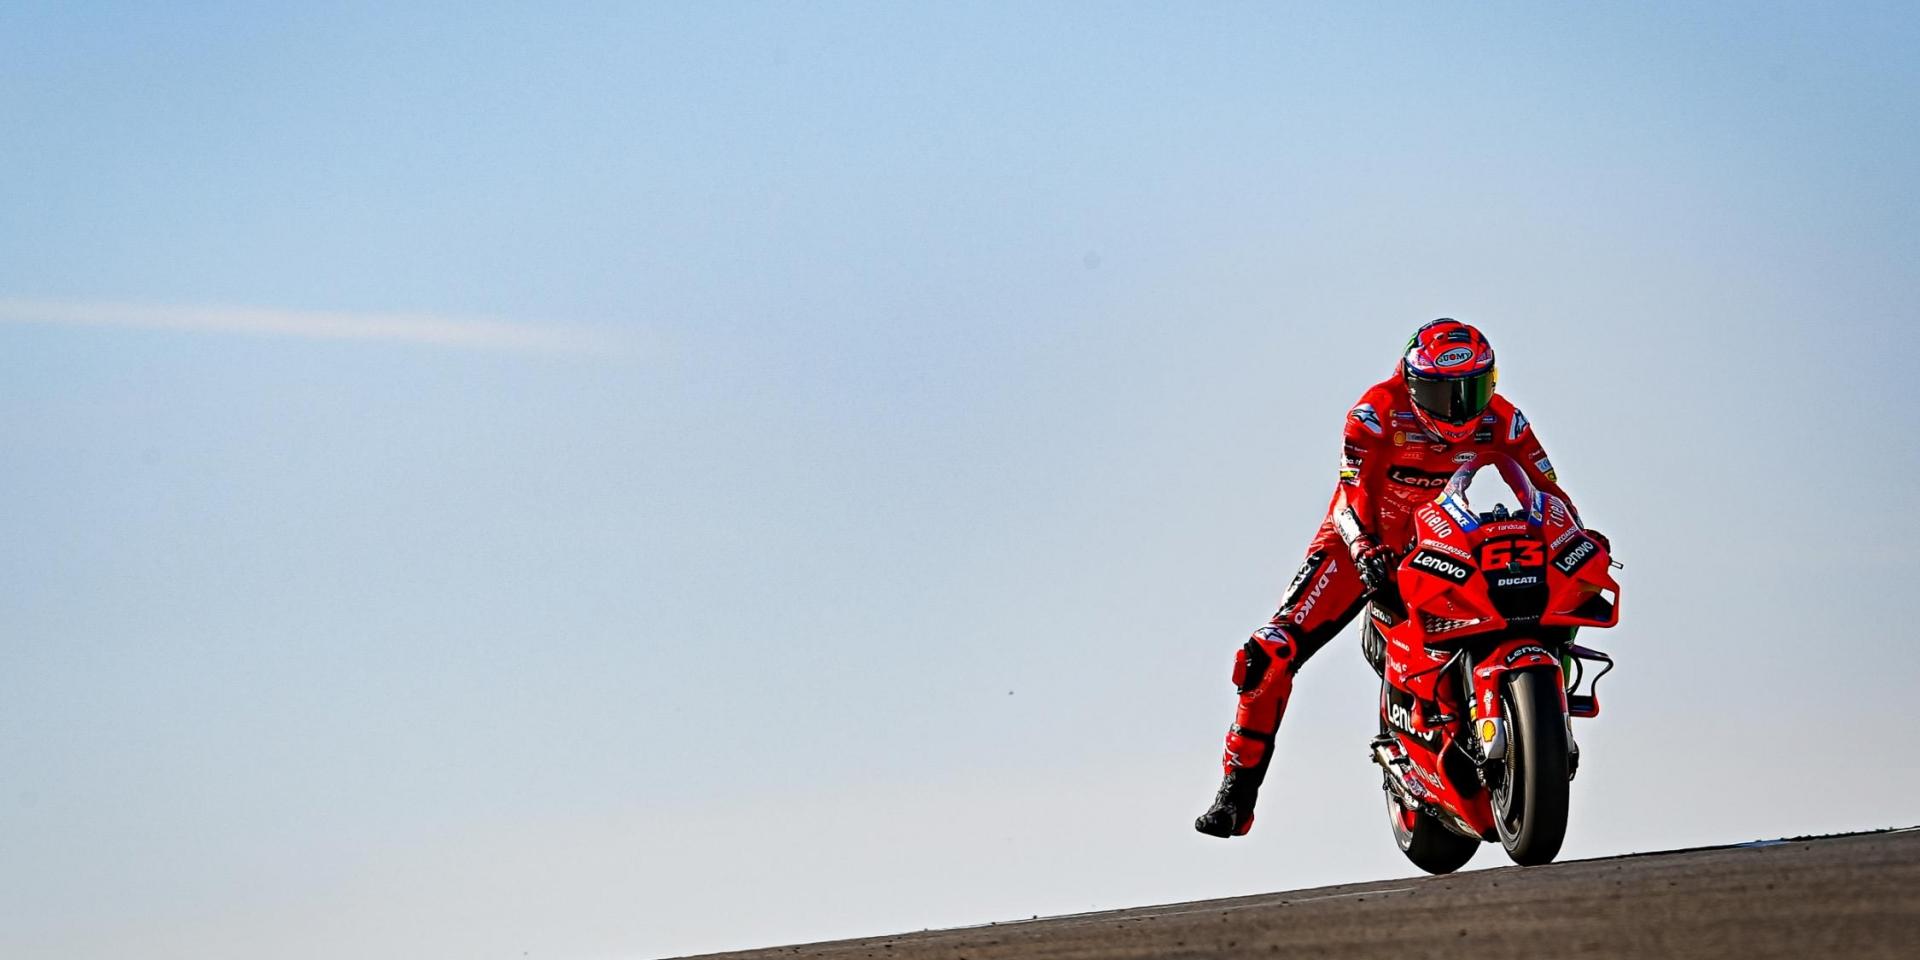 Bagnaia的首勝!VR46學院養成大成功!Valentino Rossi:我一直在催眠Pecco前硬後軟!前硬後軟!前硬後軟!